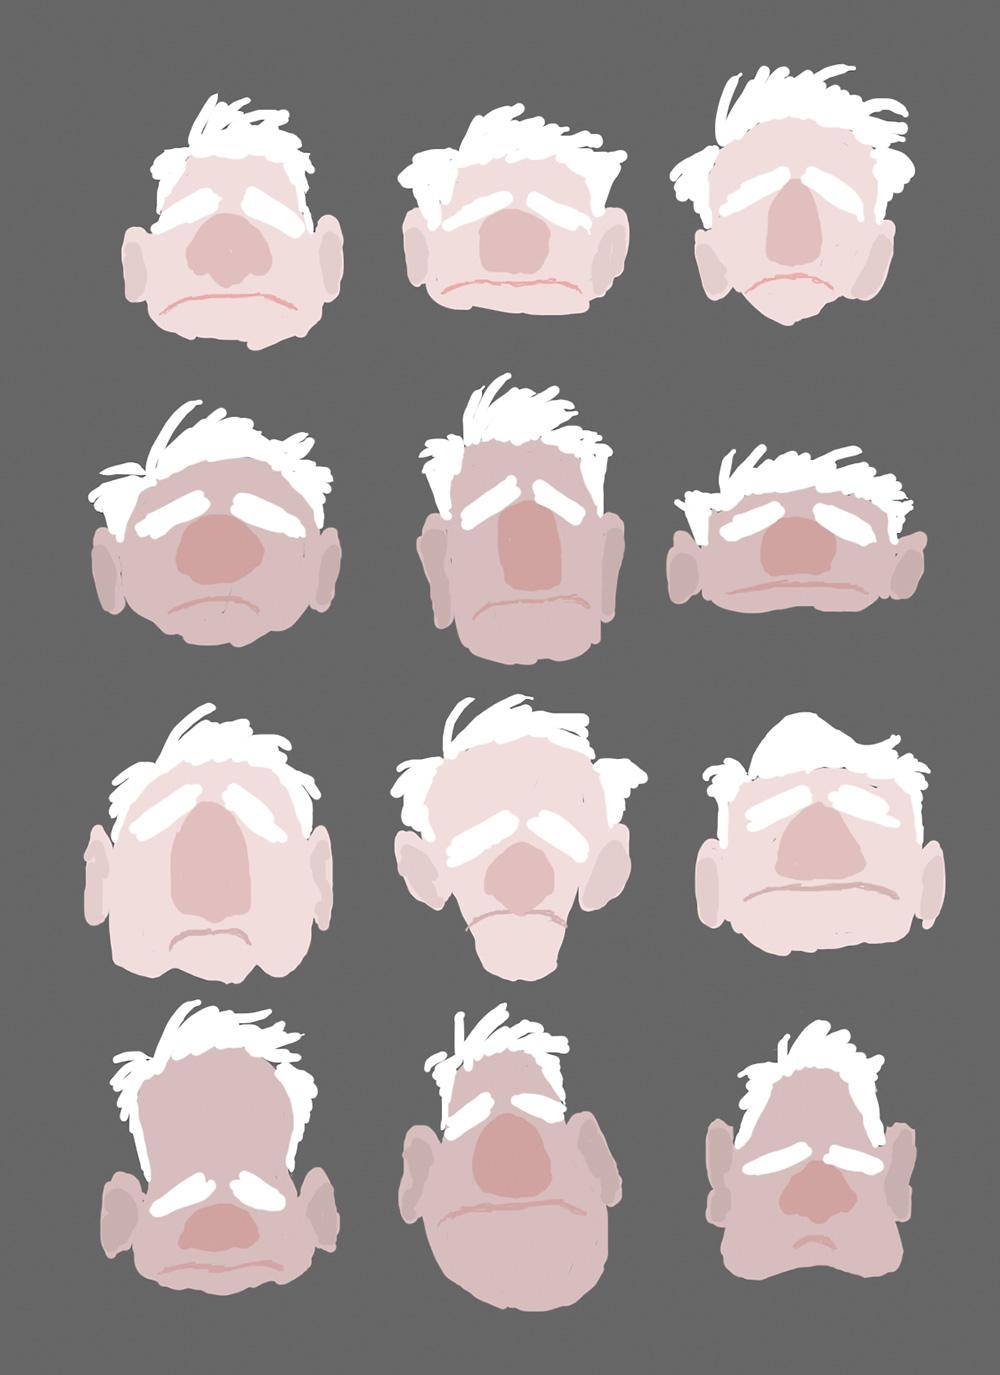 UP-Concept-Art-Carl-Faces.jpg